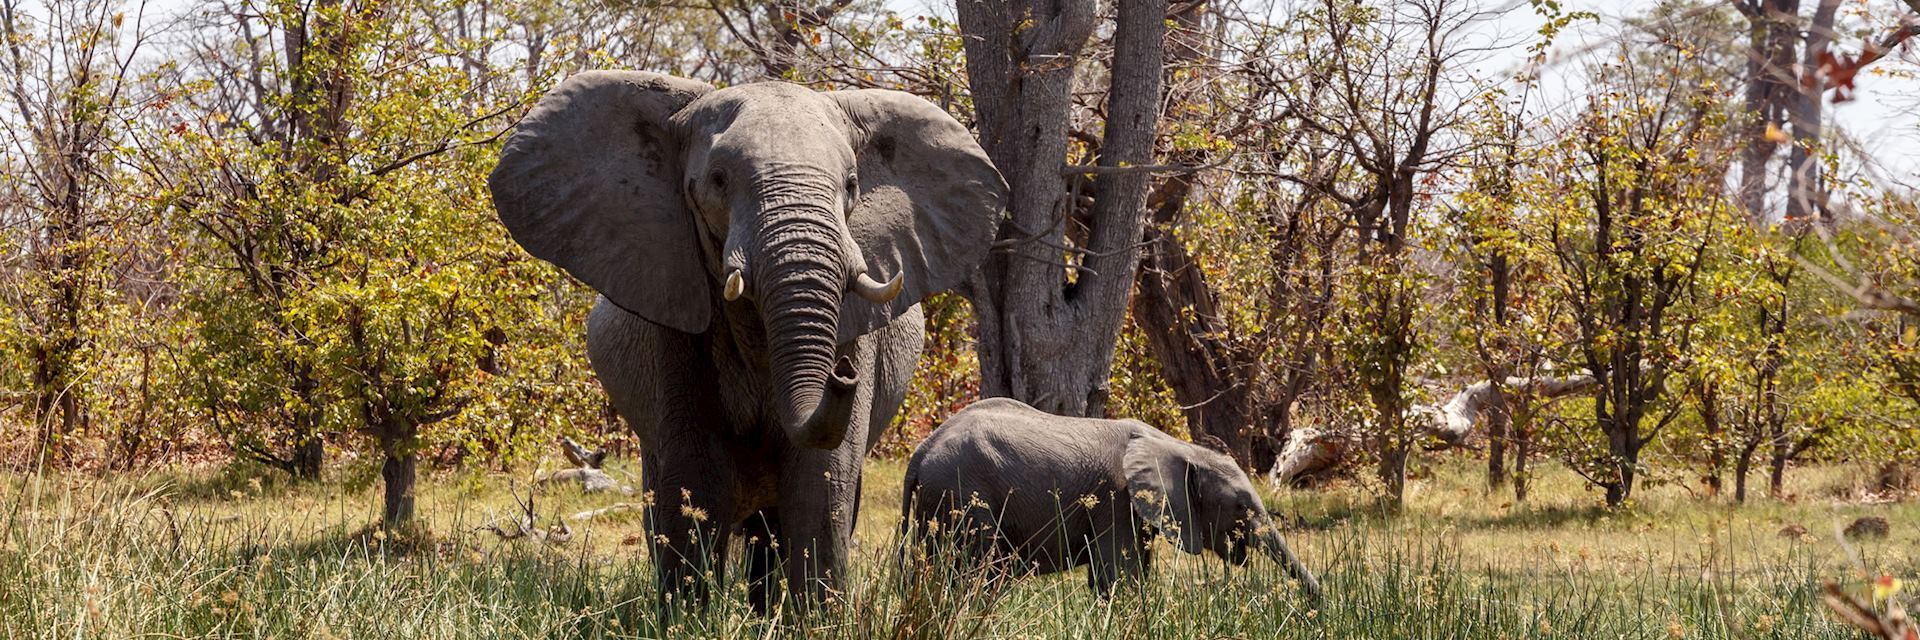 Elephant in Moremi Wildlife Reserve, Bostwana